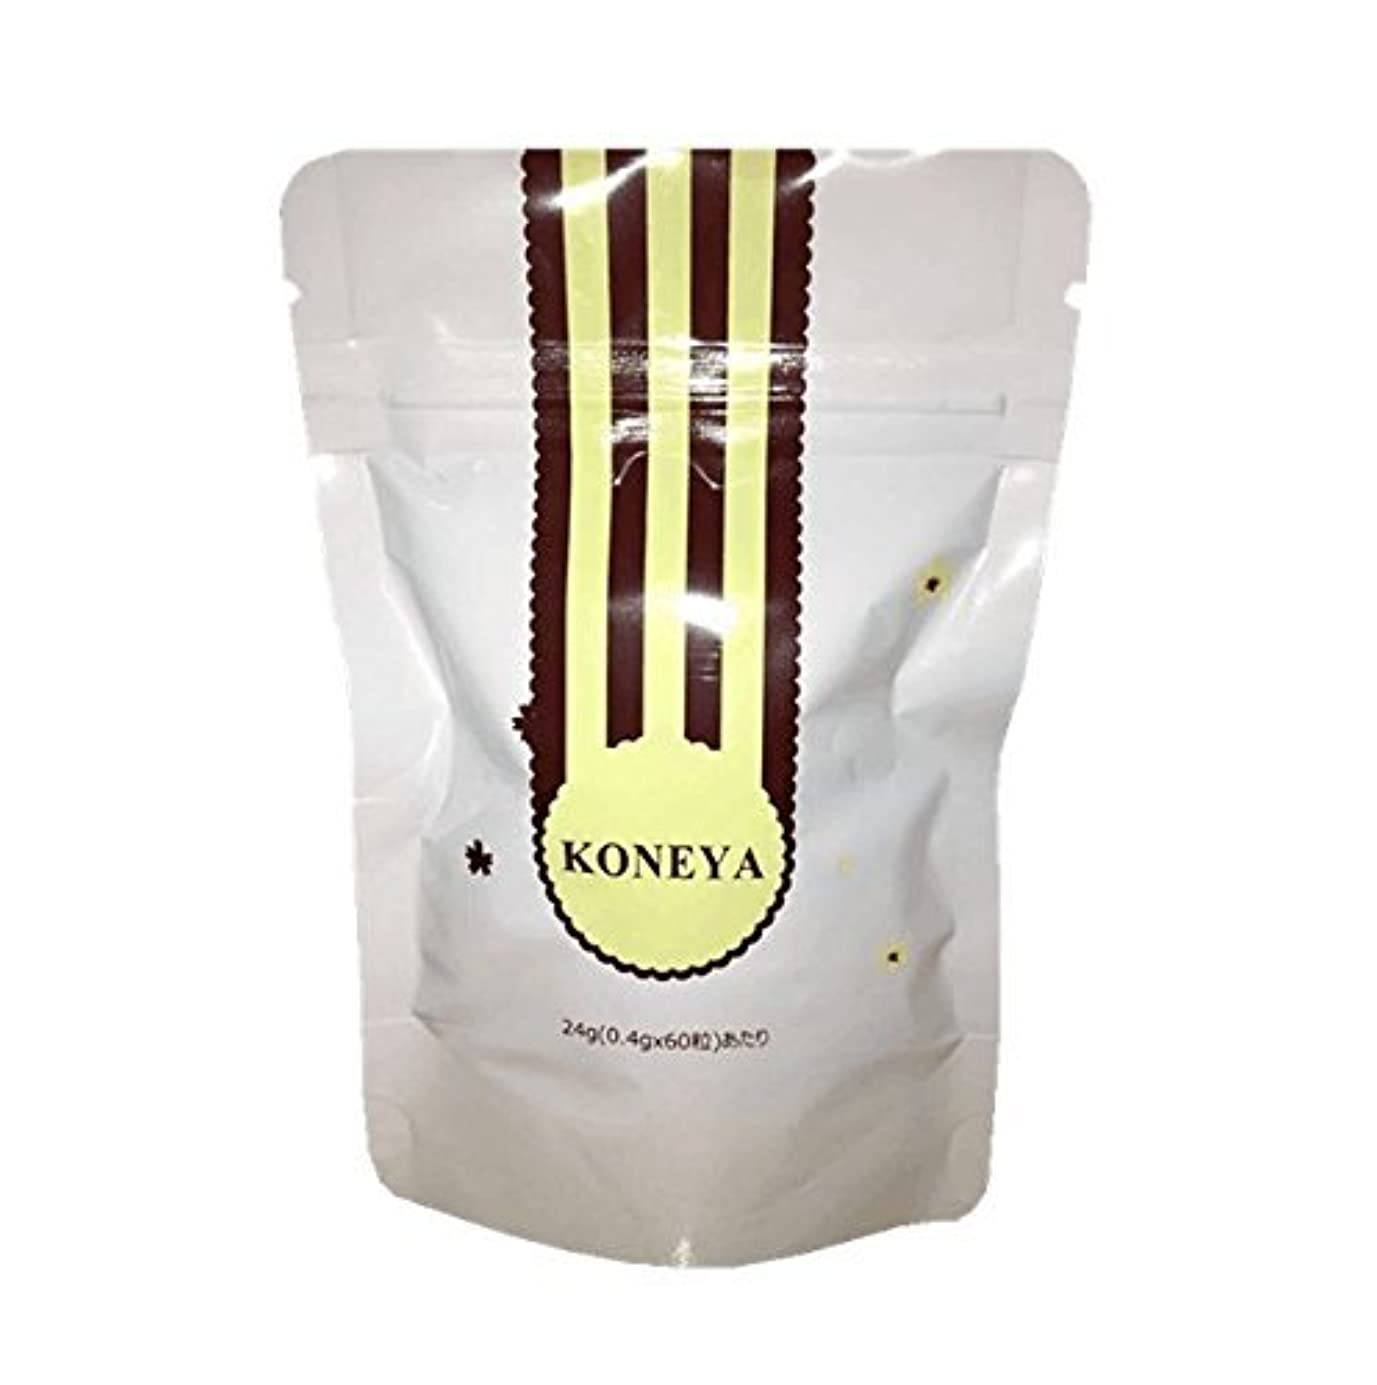 KONEYA ダイエット酵素サプリメント